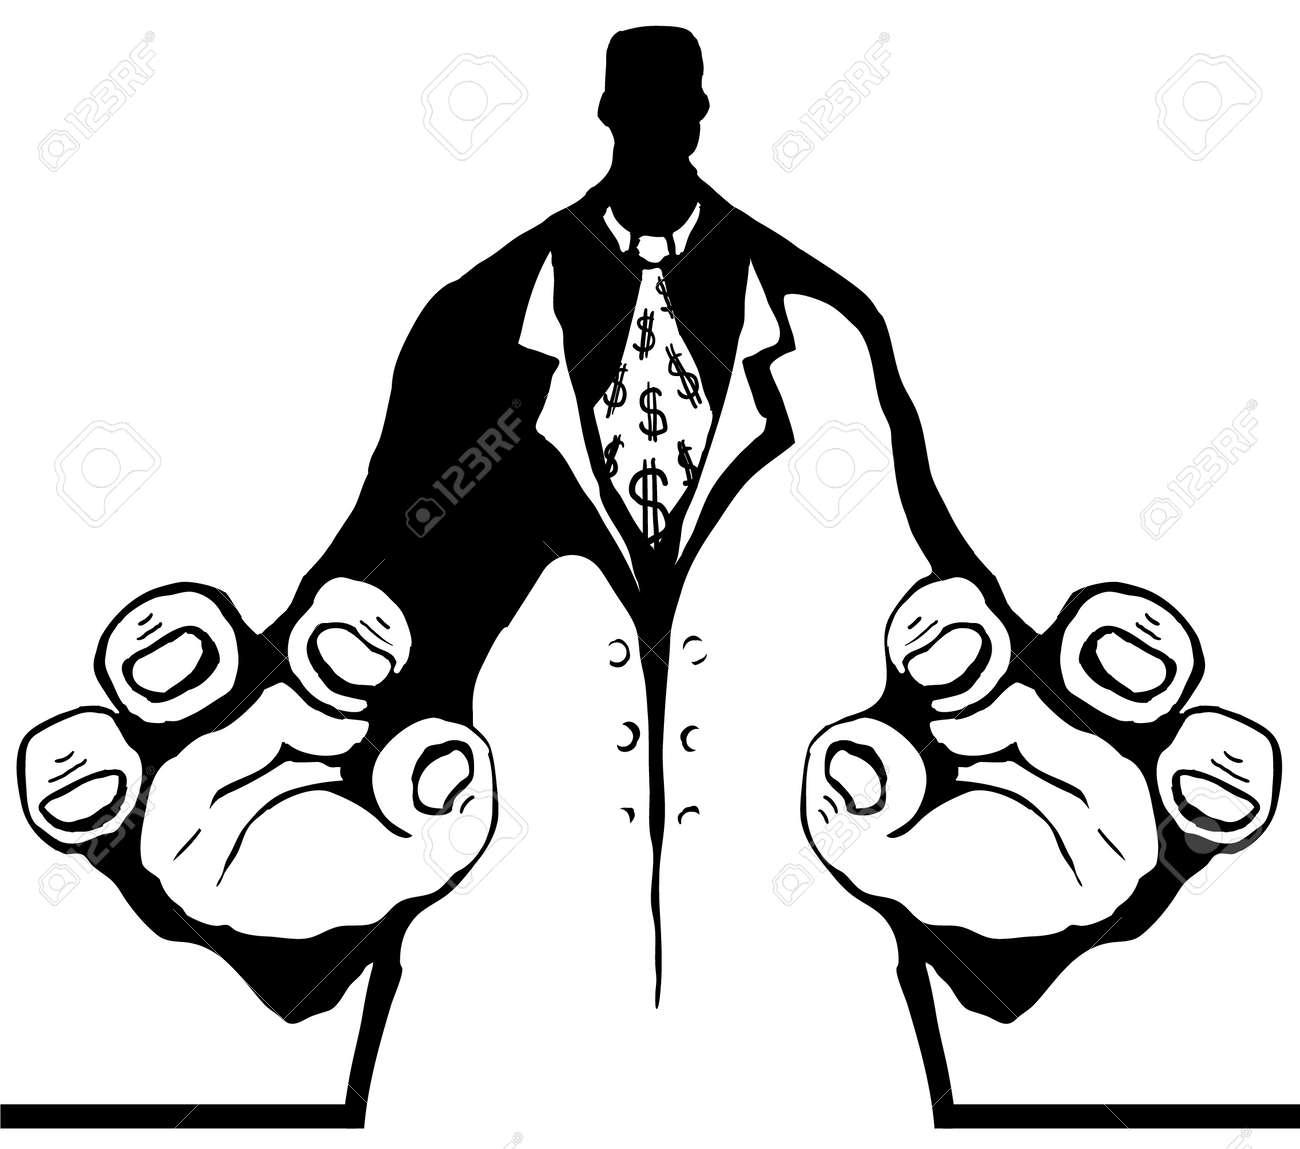 Figura De Burócrata Agarrar Dibujos Animados De Plantilla Negra ...